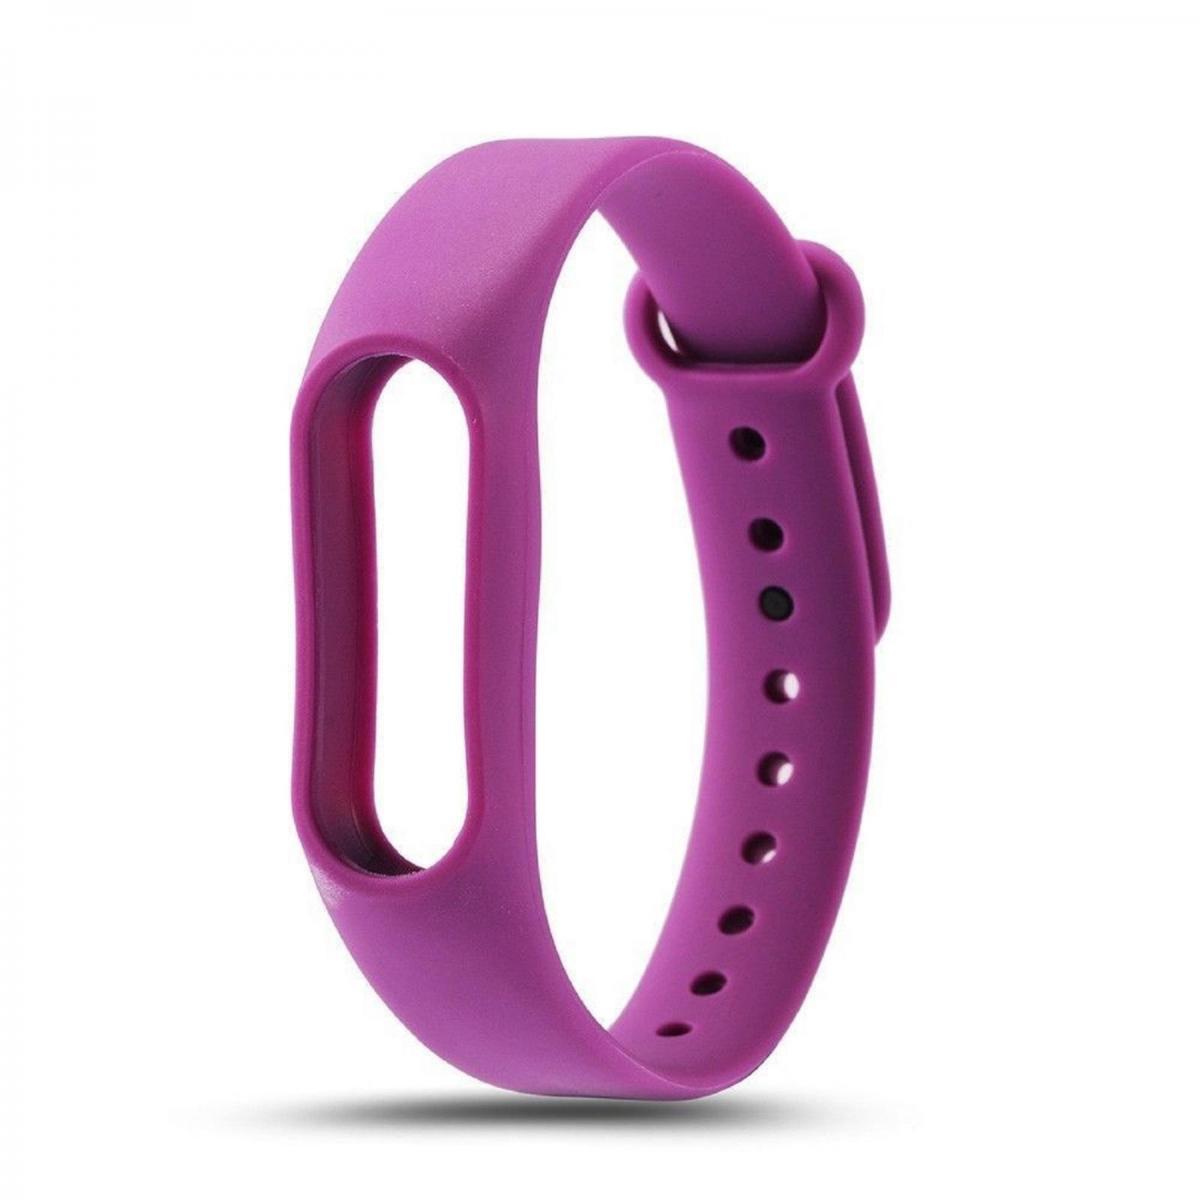 74f1f821aa5a ... correa de silicona para pulsera reloj Xiaomi Mi Band 3 Color Morado.  Recambio ...